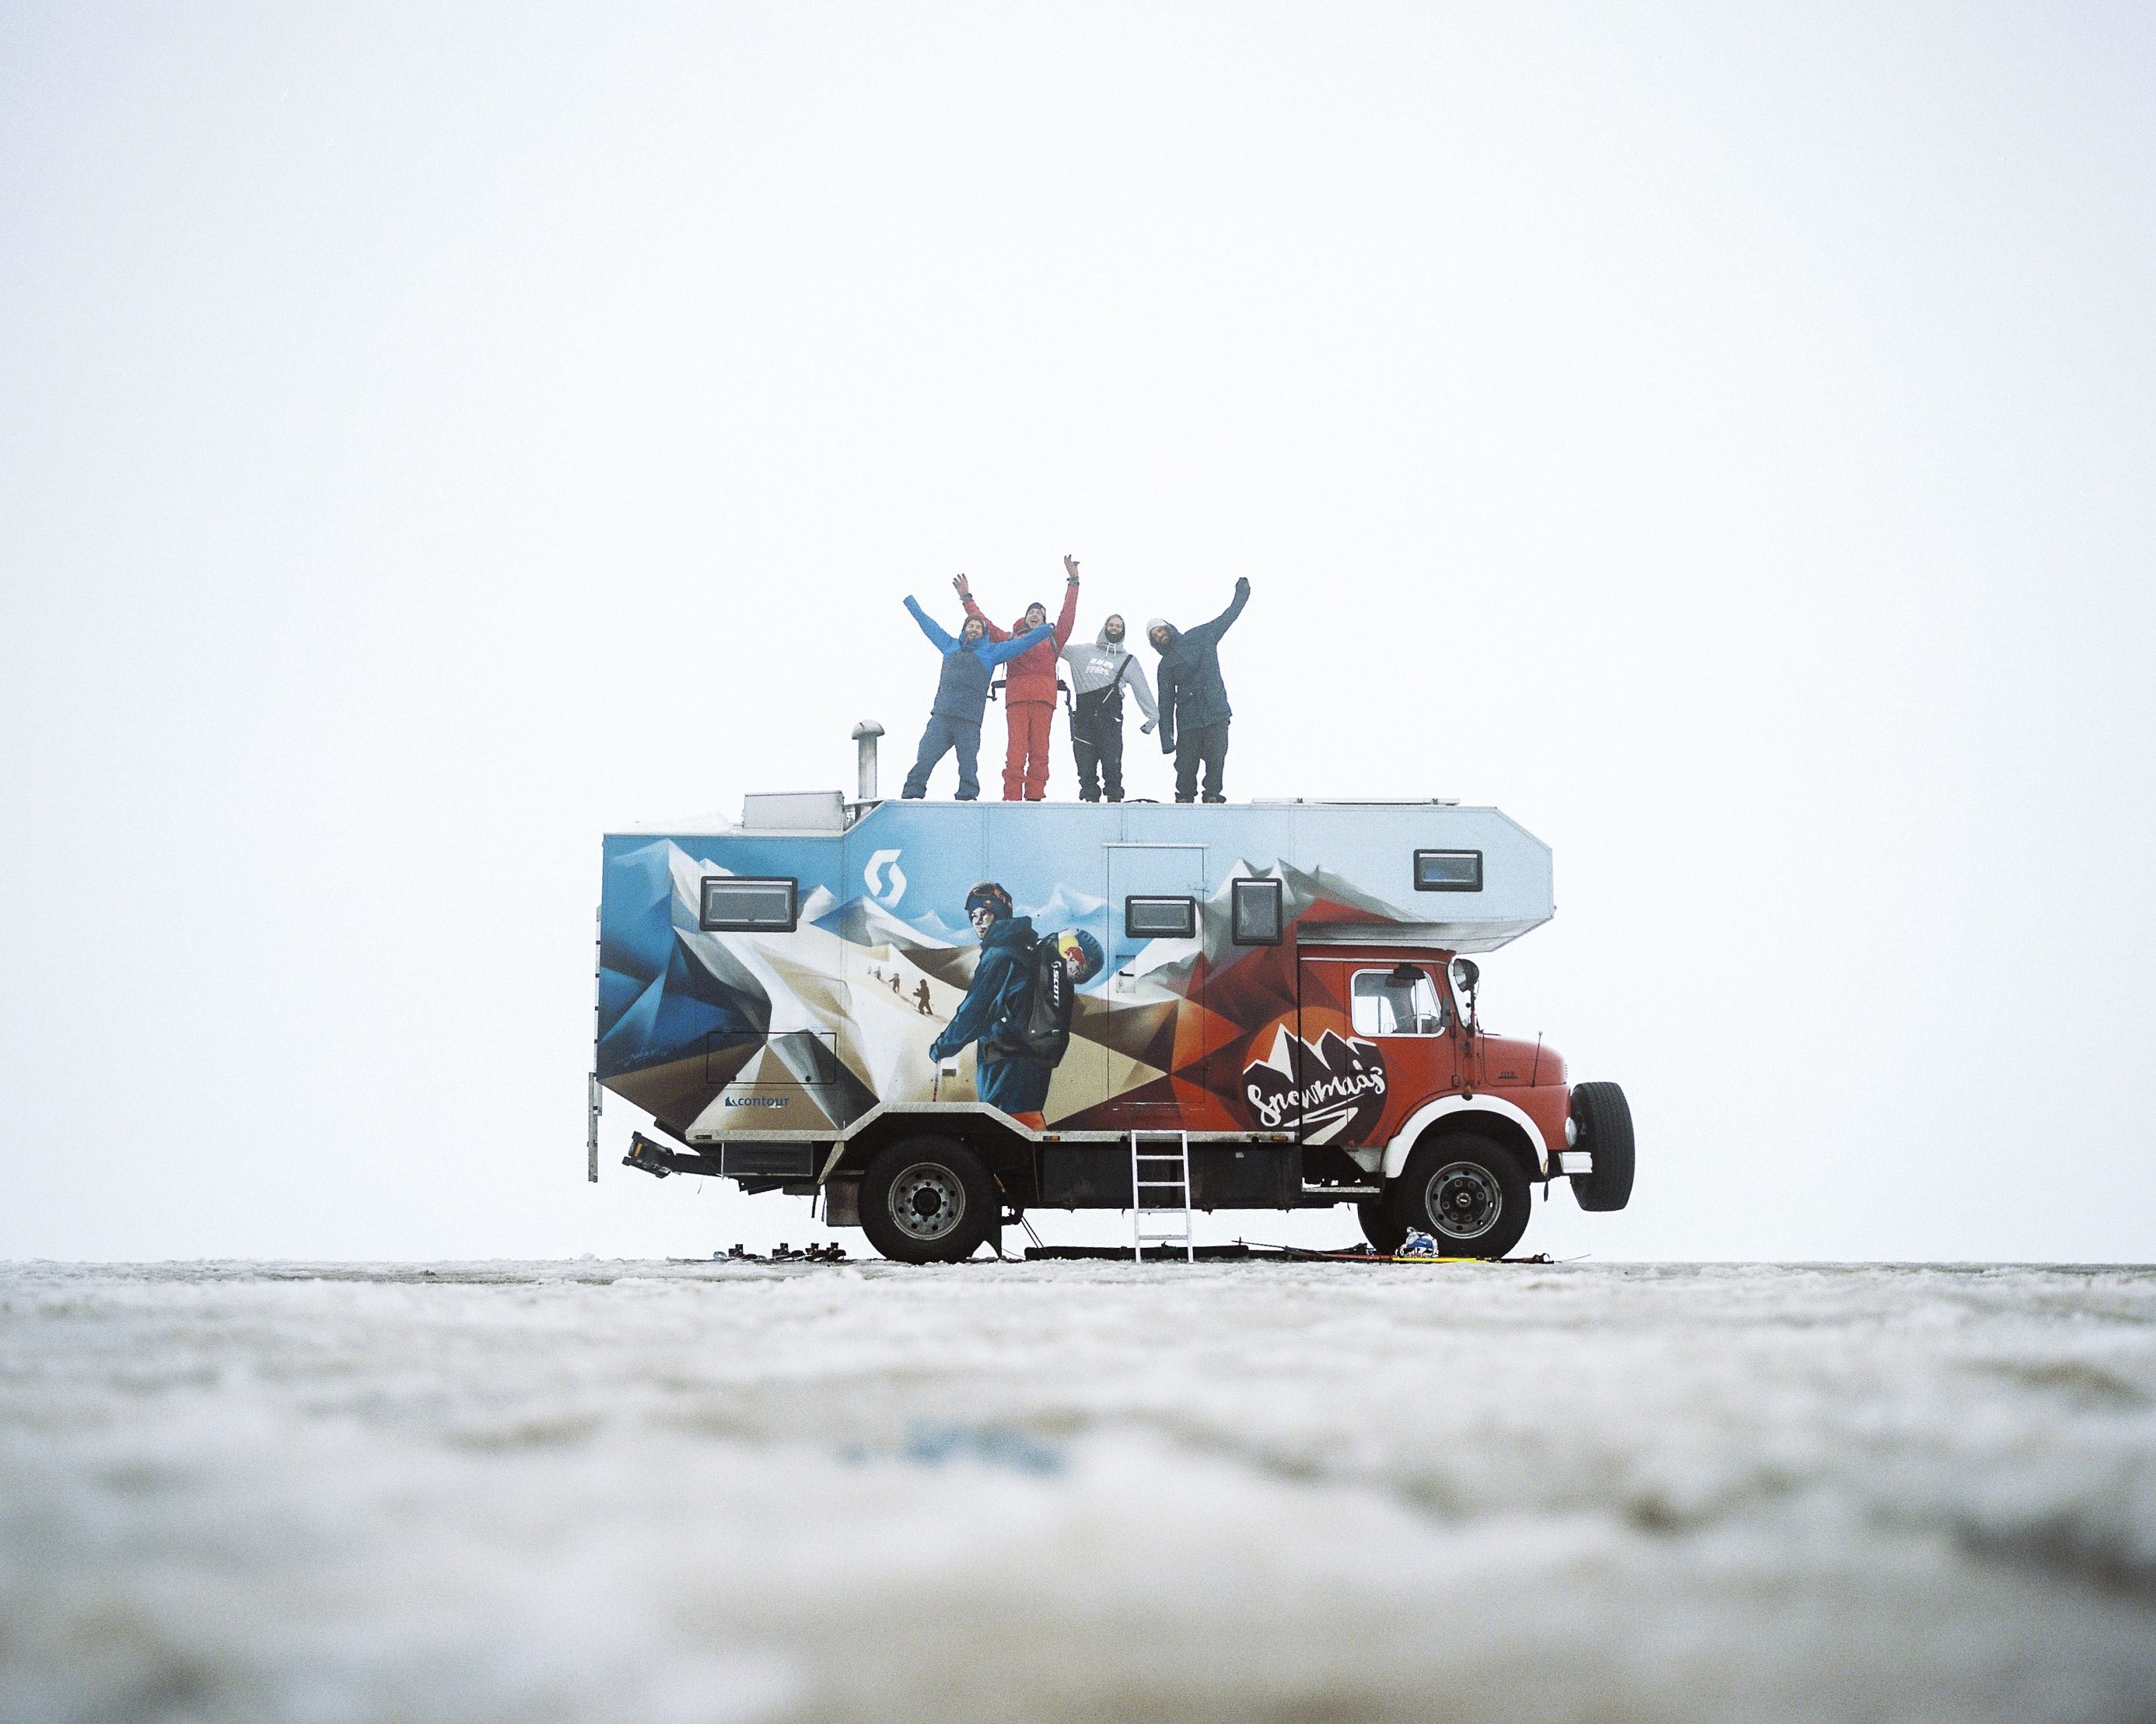 freeride, film, festival, 2017, snowmads, crew, kirgisistan, yamas